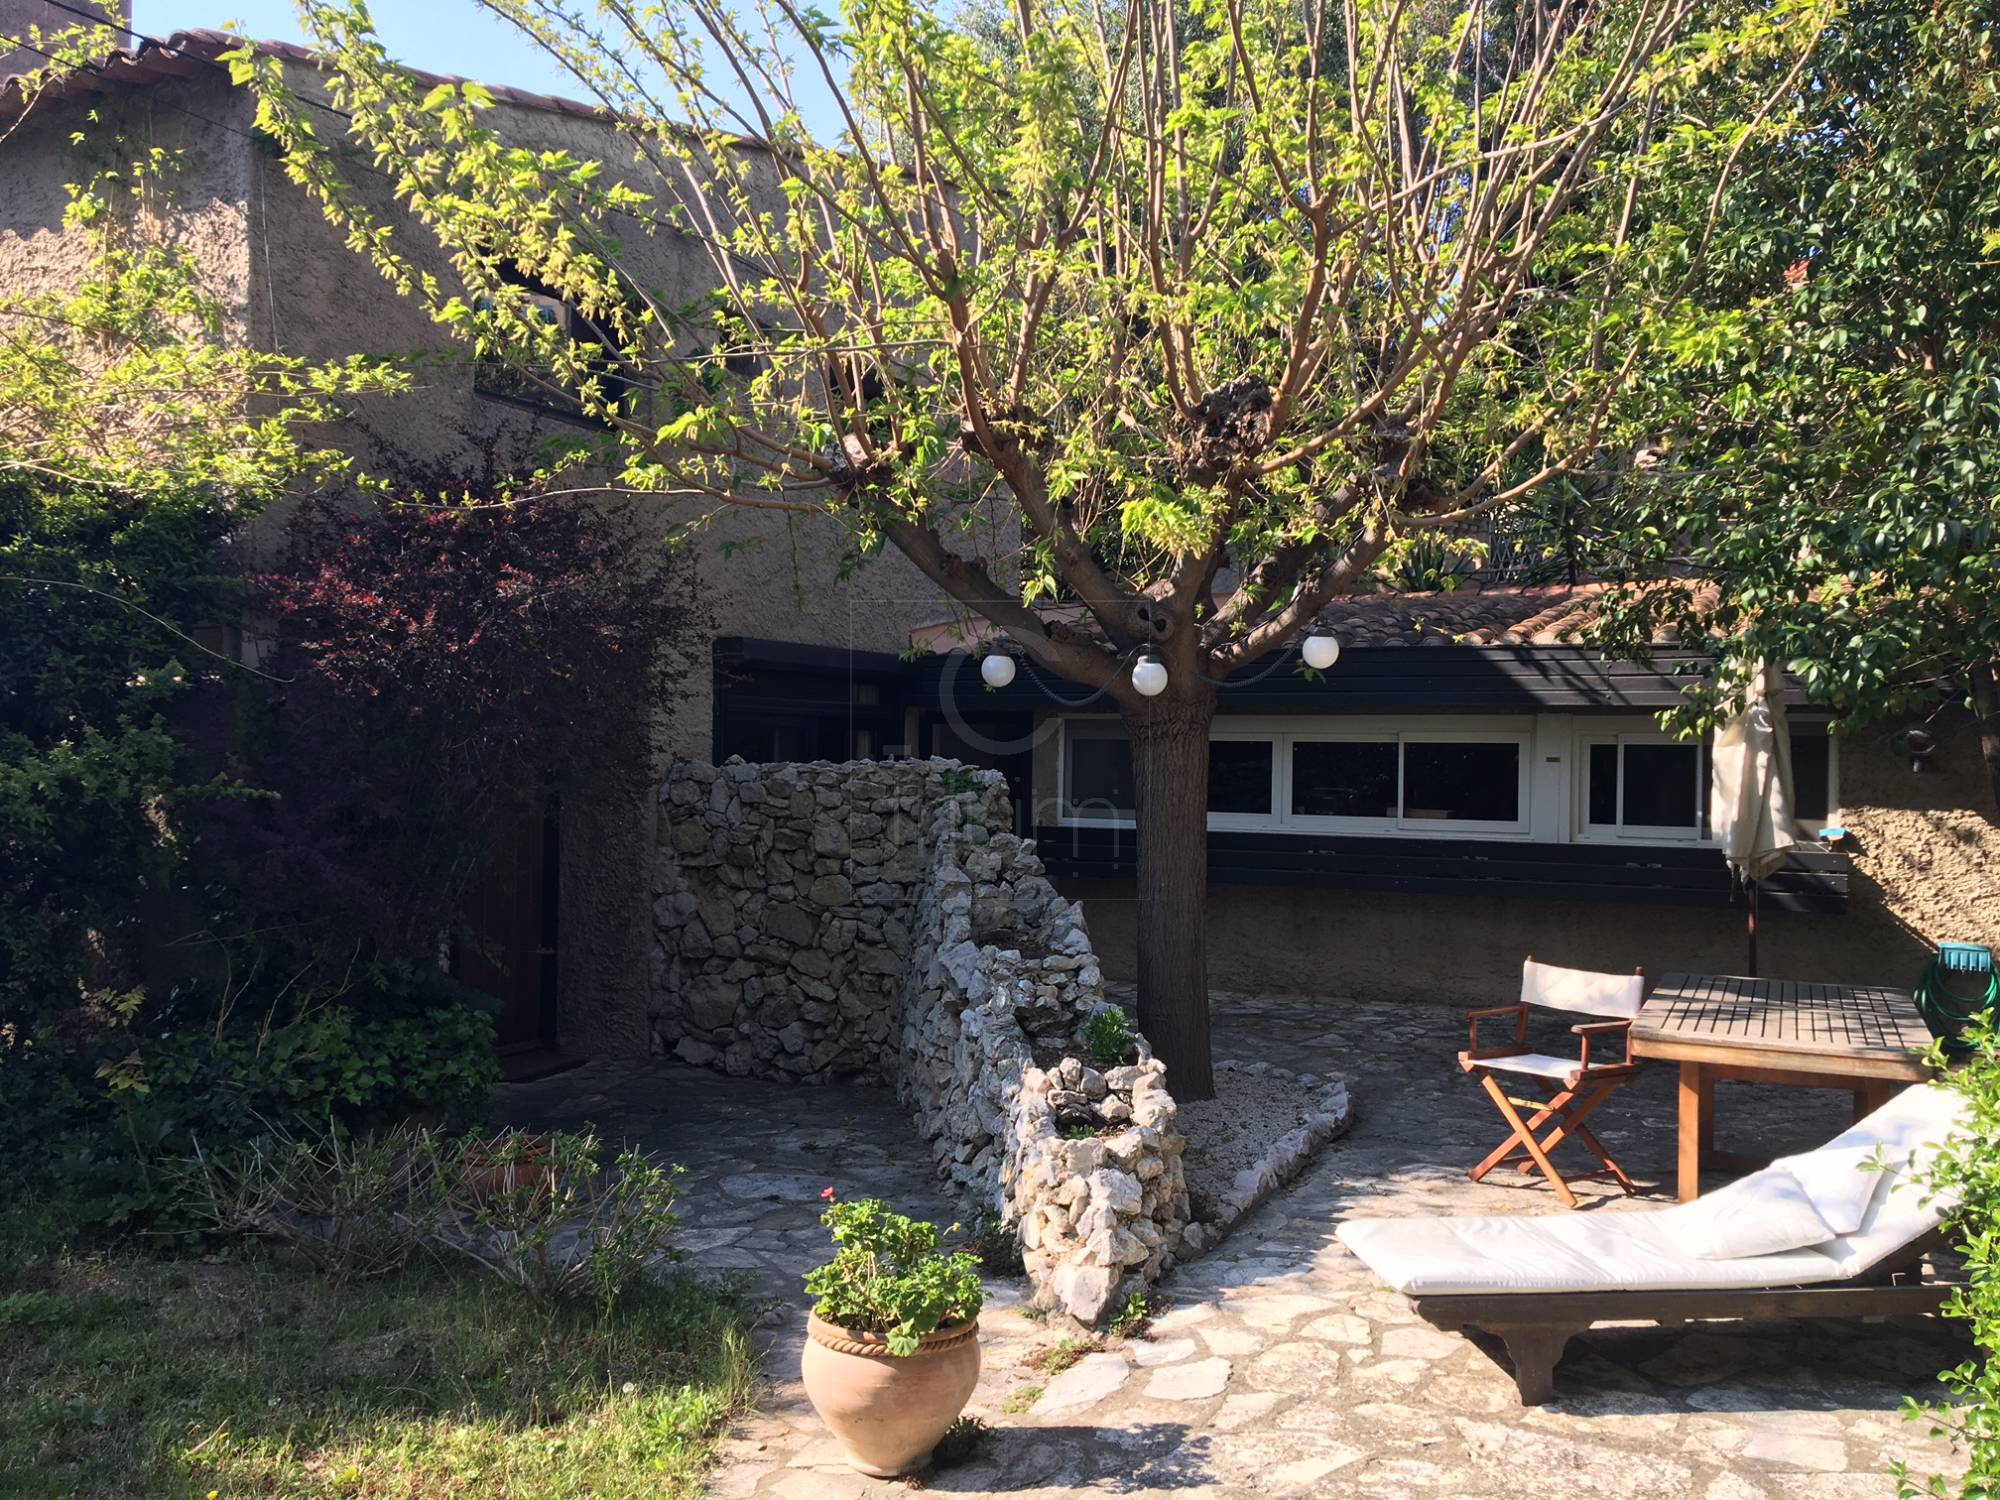 Vente maison marseille 7e jardin terrasse parking t5 f5 for Agence terrasse et jardin lyon